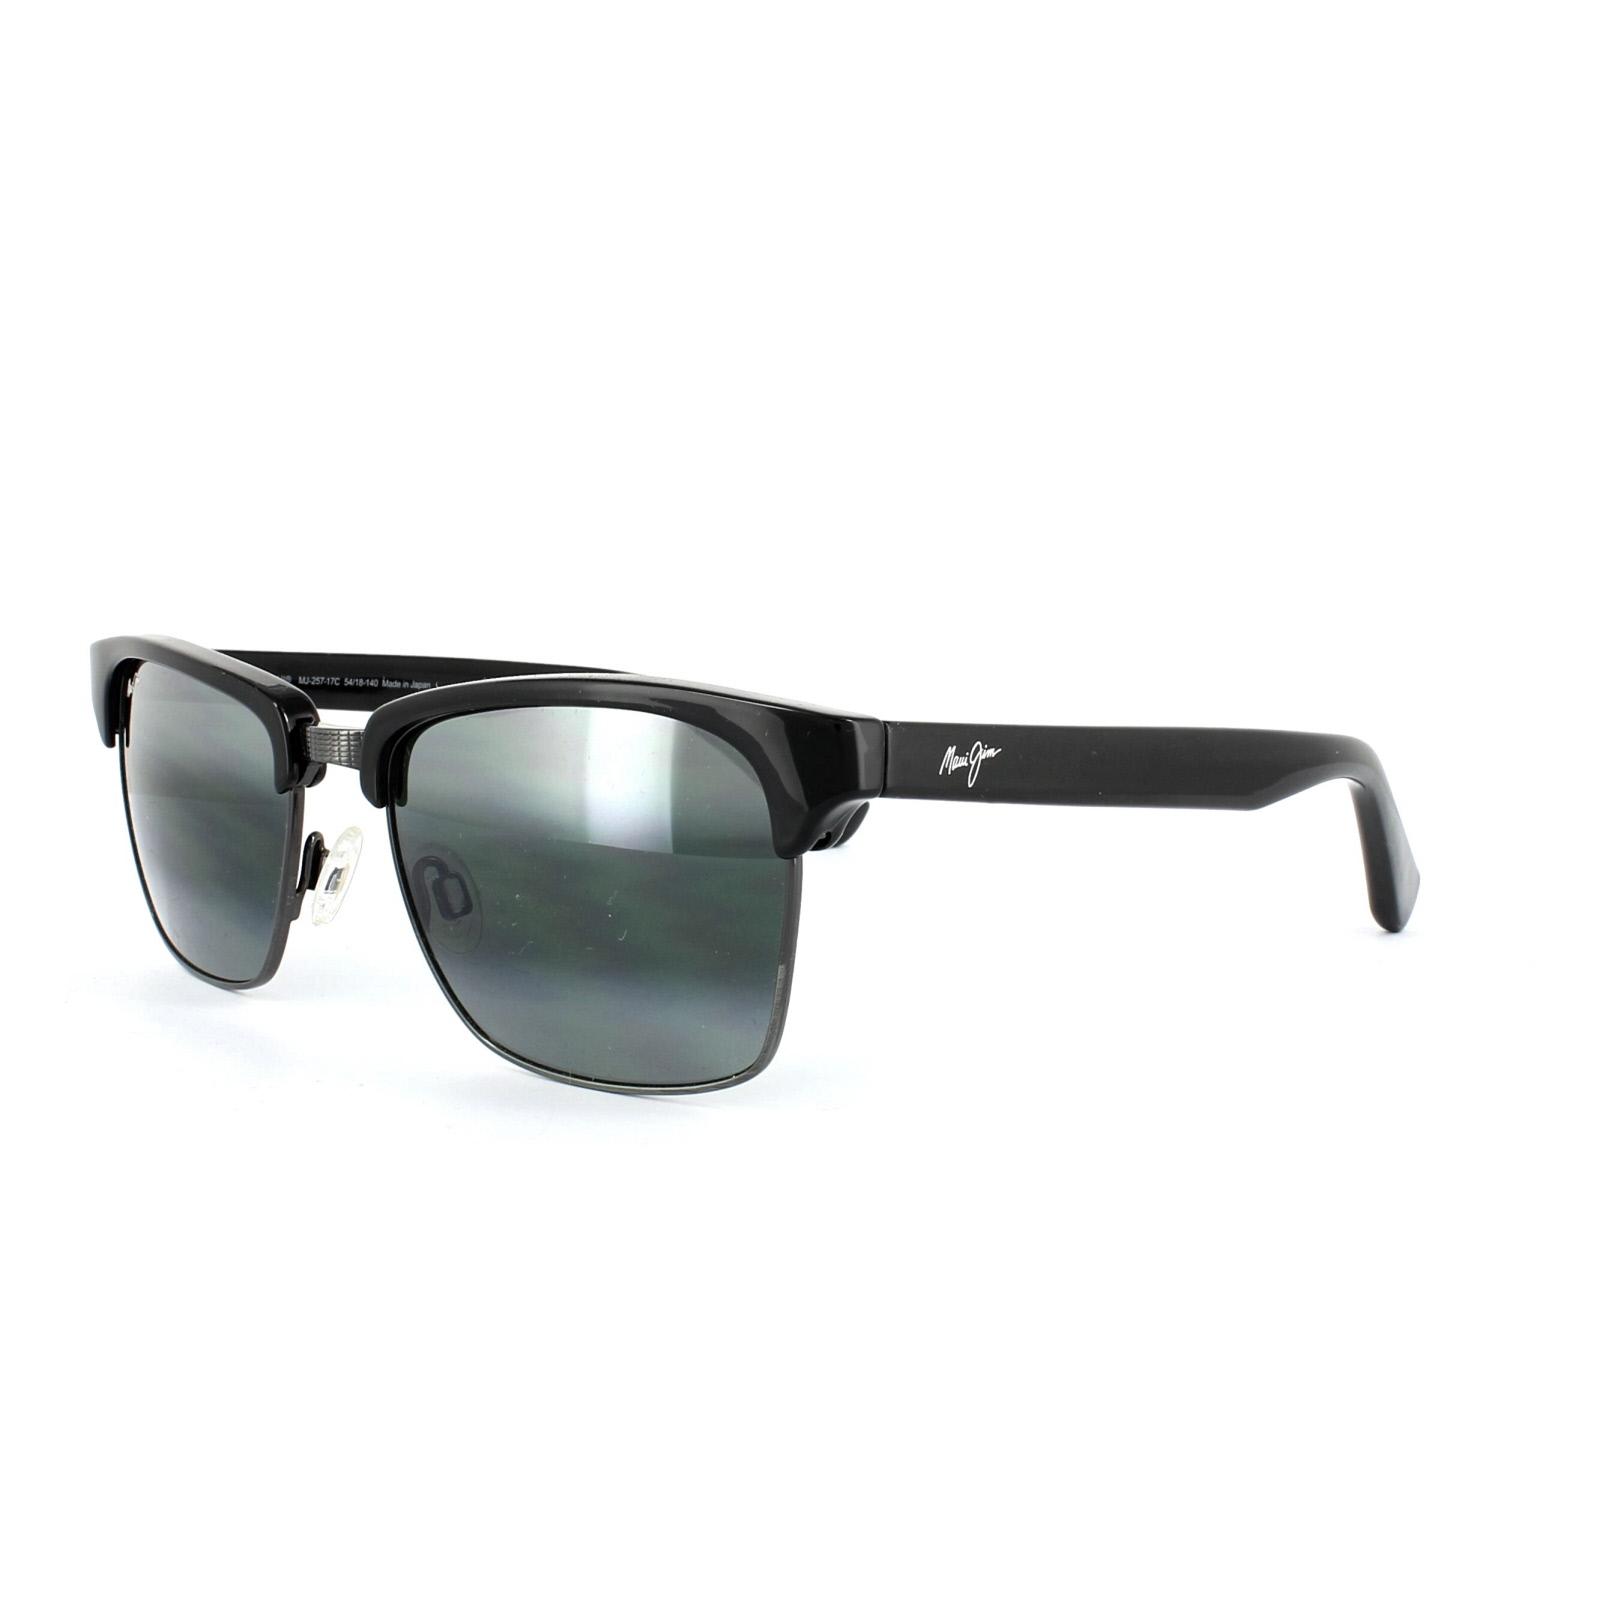 c66128665310 Cheap Maui Jim Kawika Sunglasses - Discounted Sunglasses